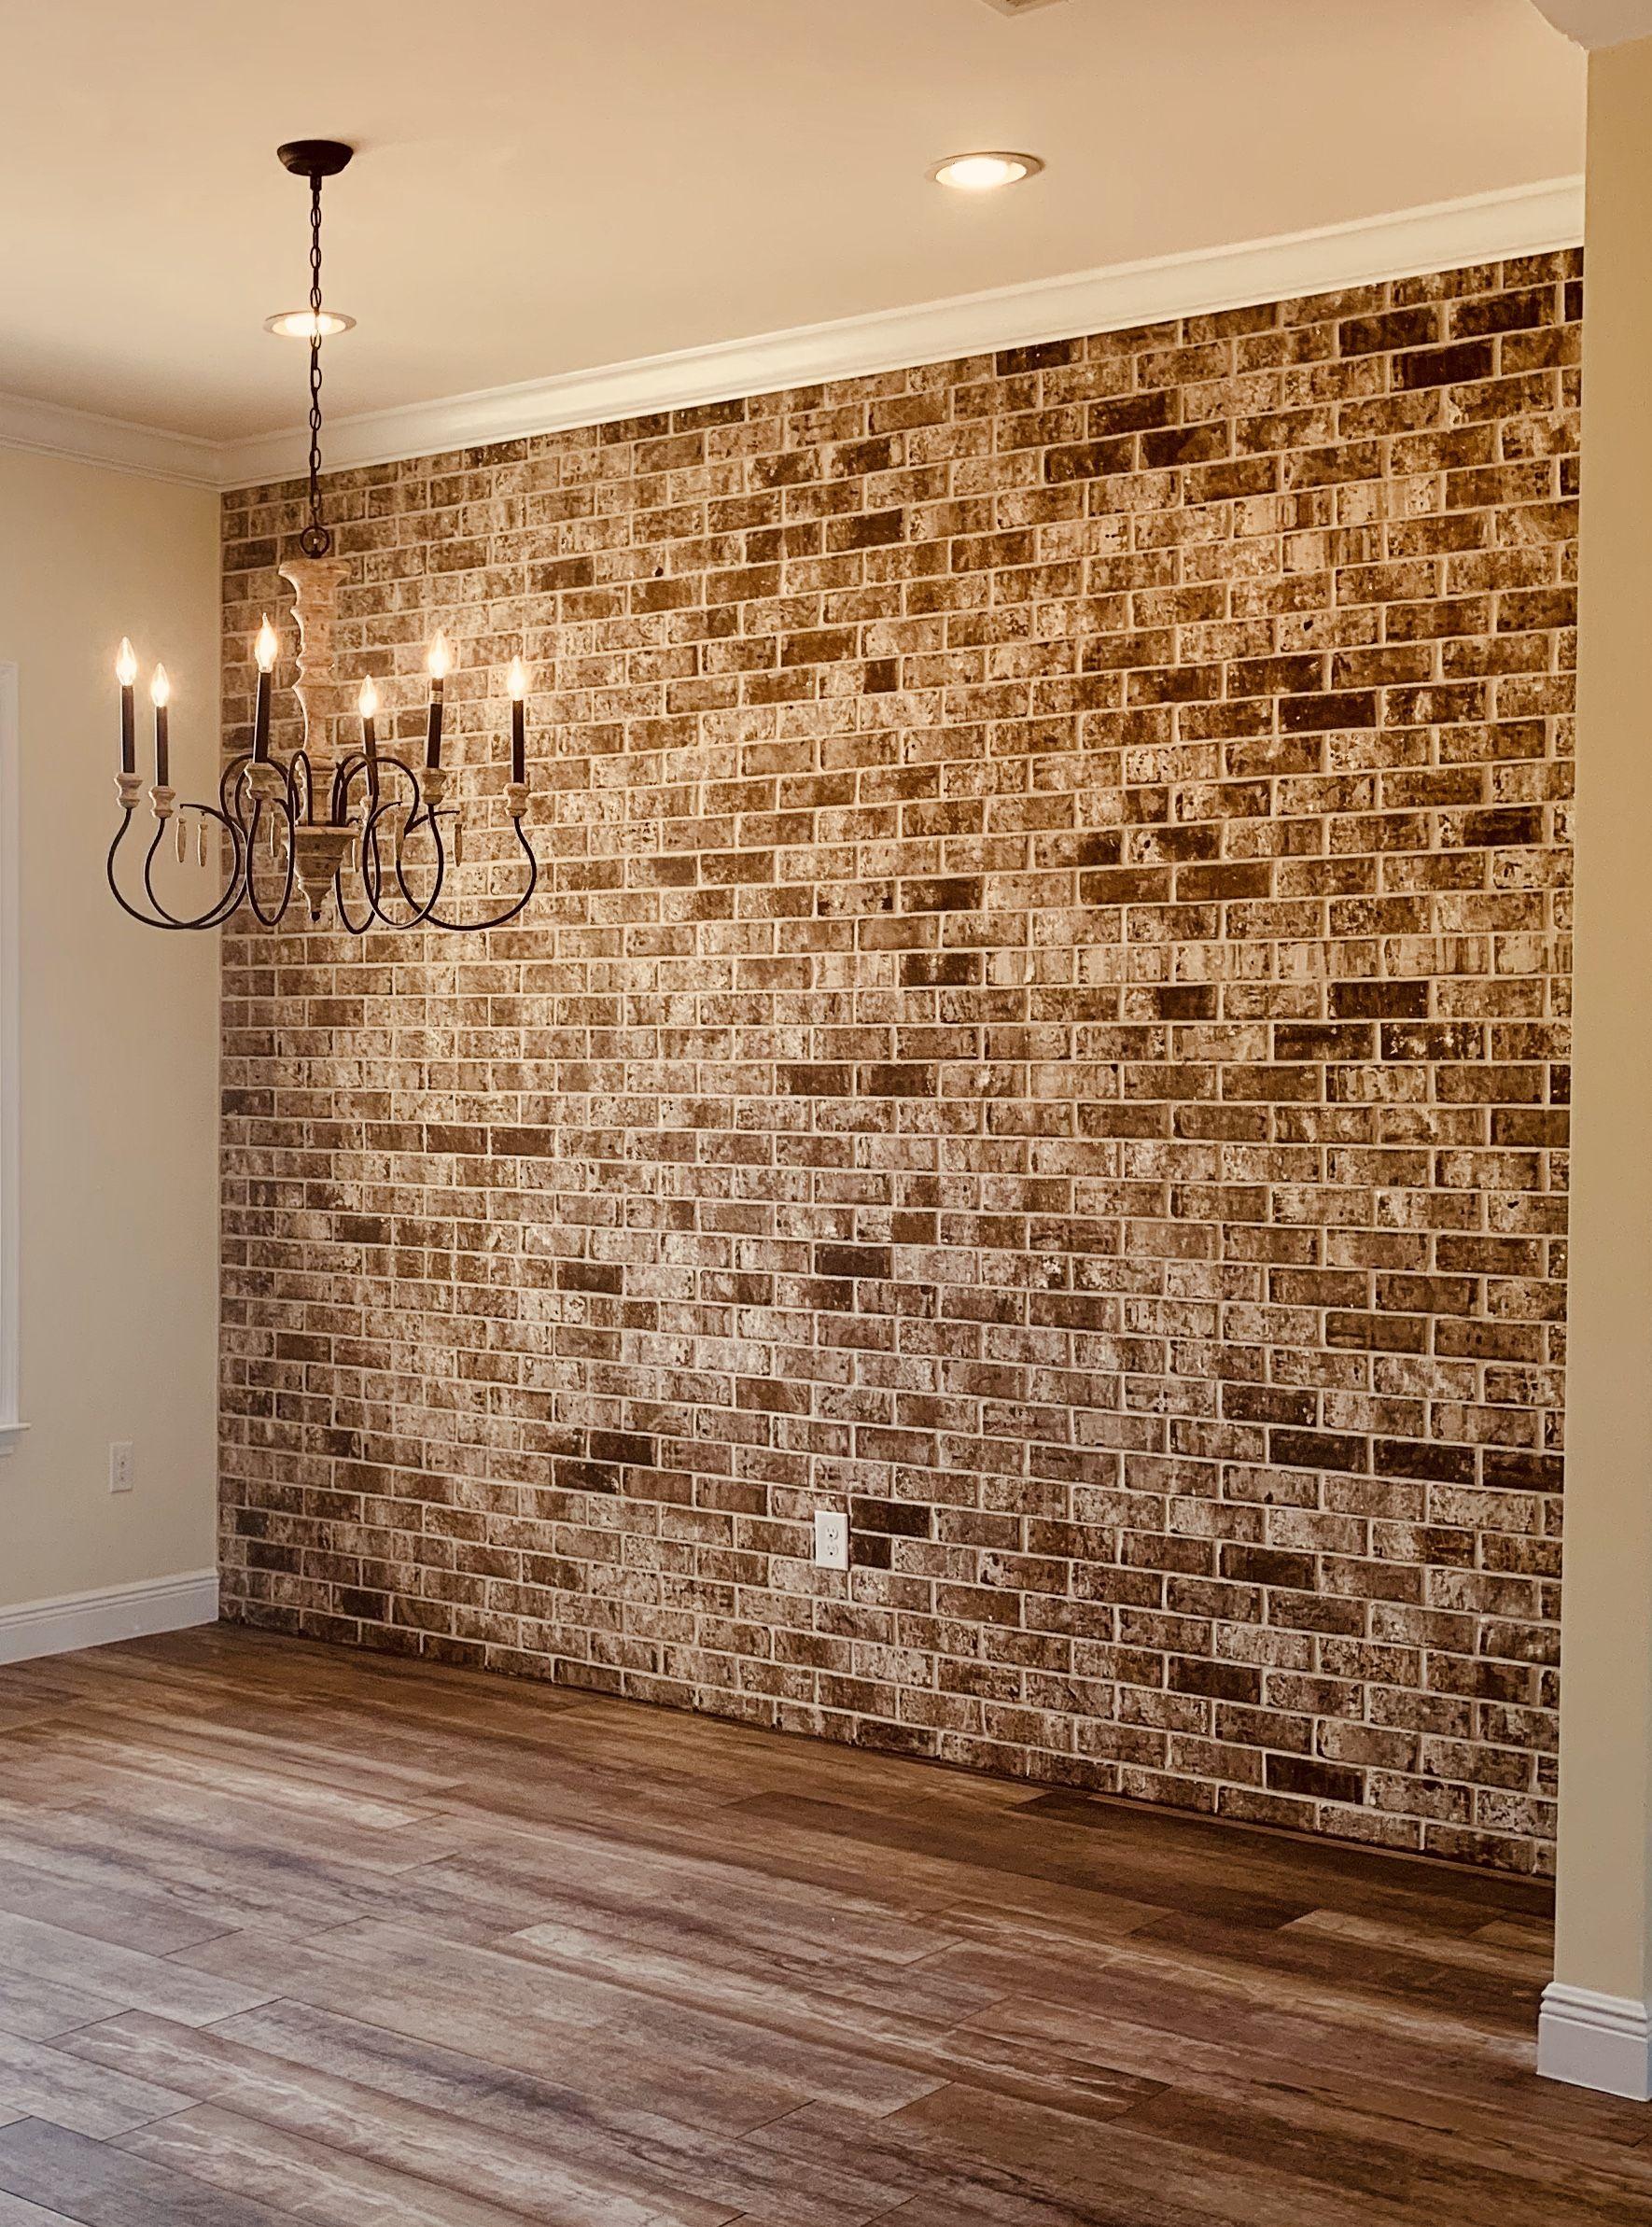 Brick Accent Wall Dining Room Brick Accent Walls Brick Wall